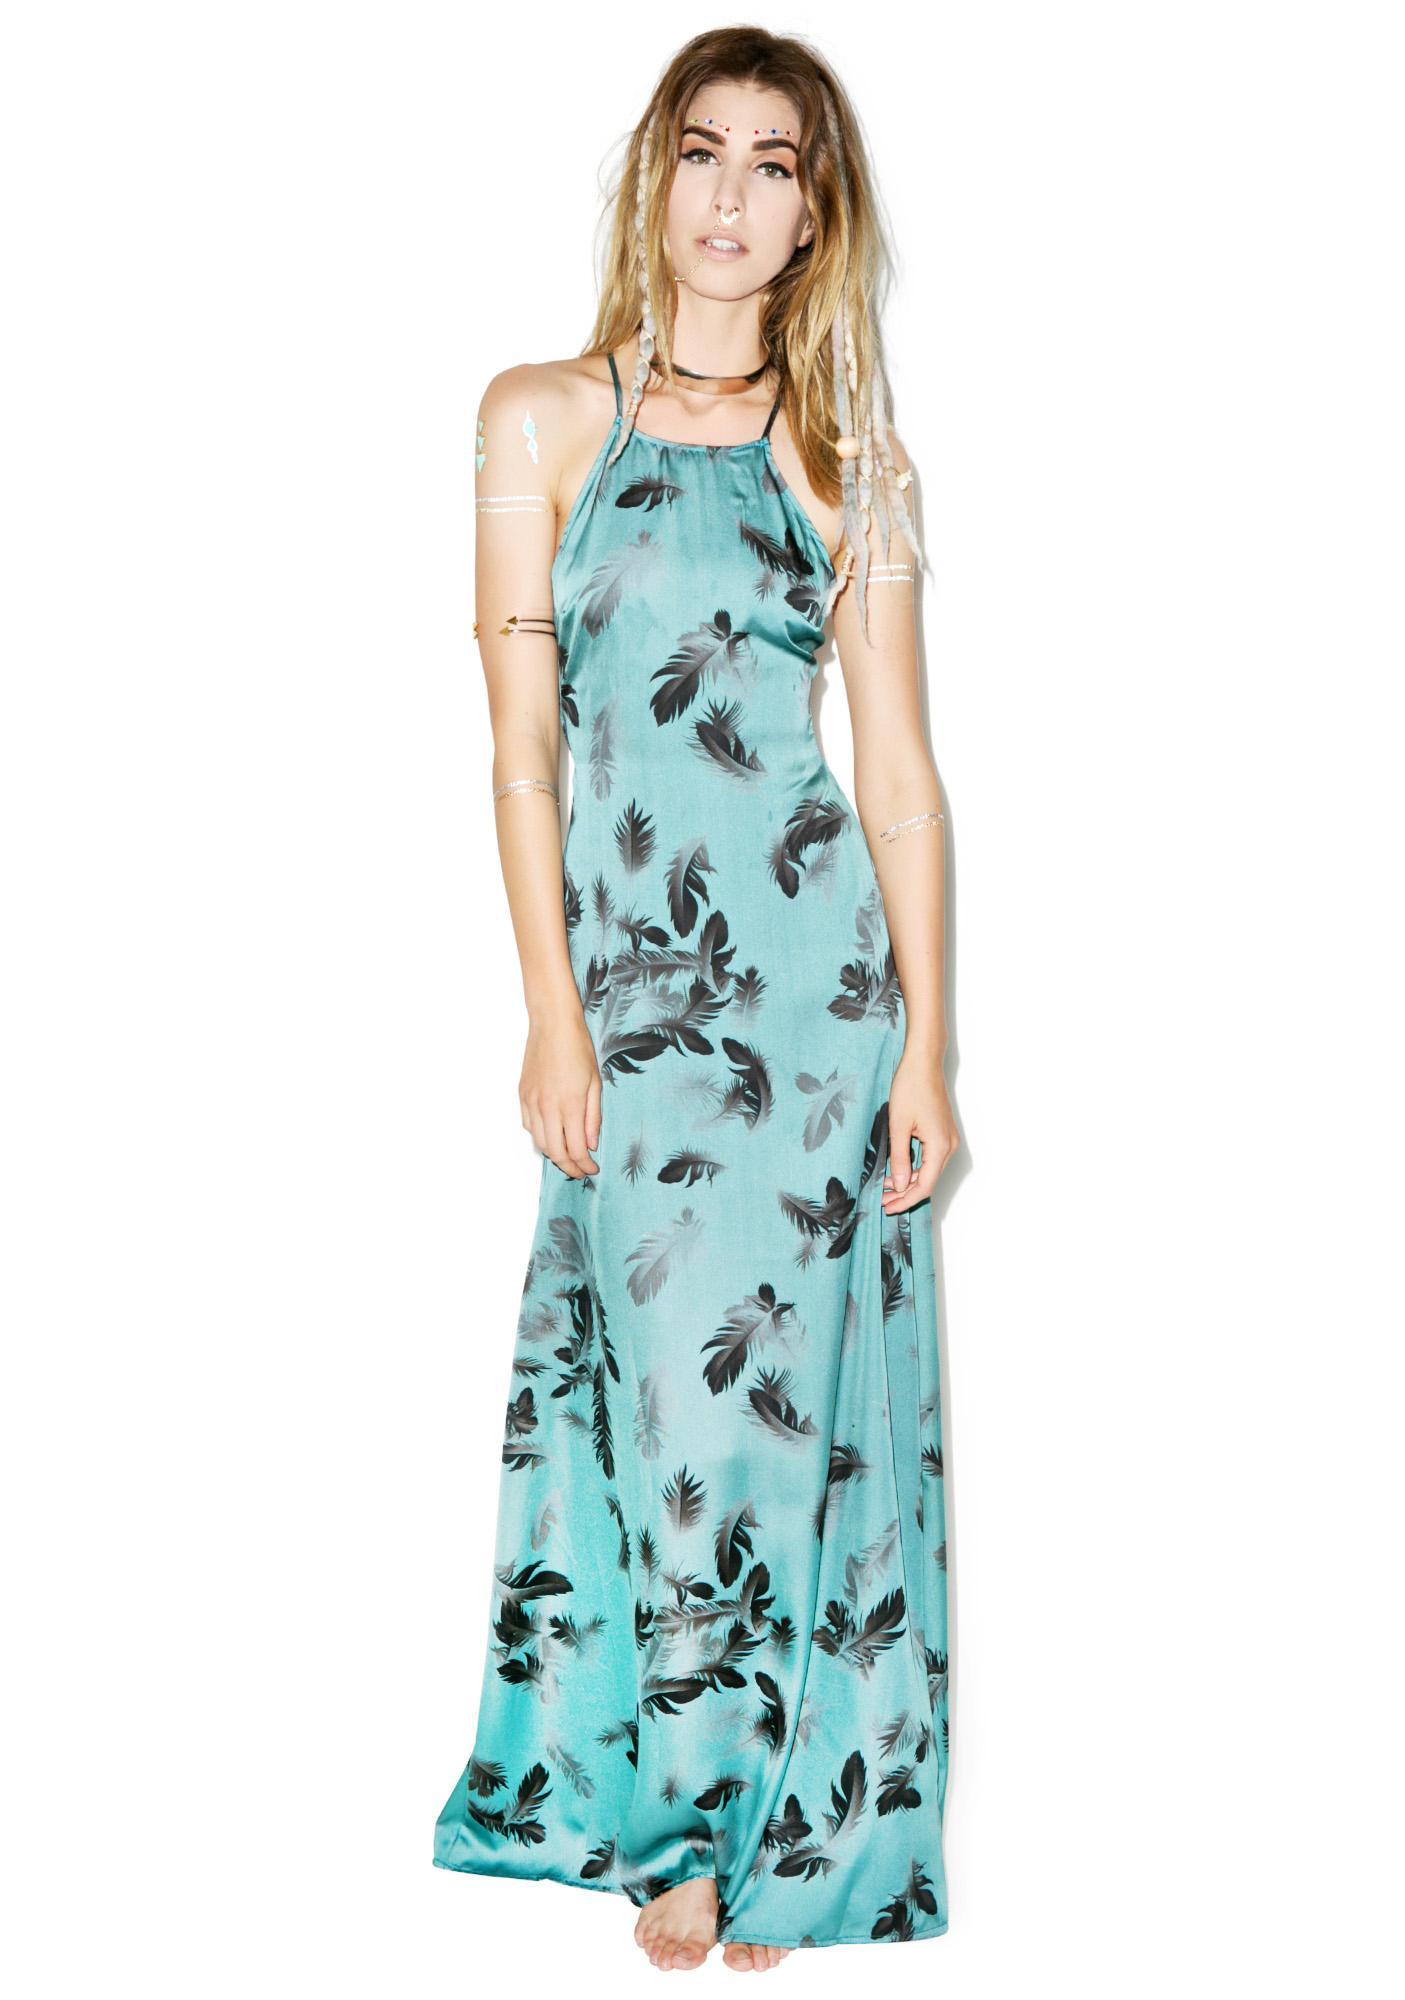 Jac Vanek Florence Dress